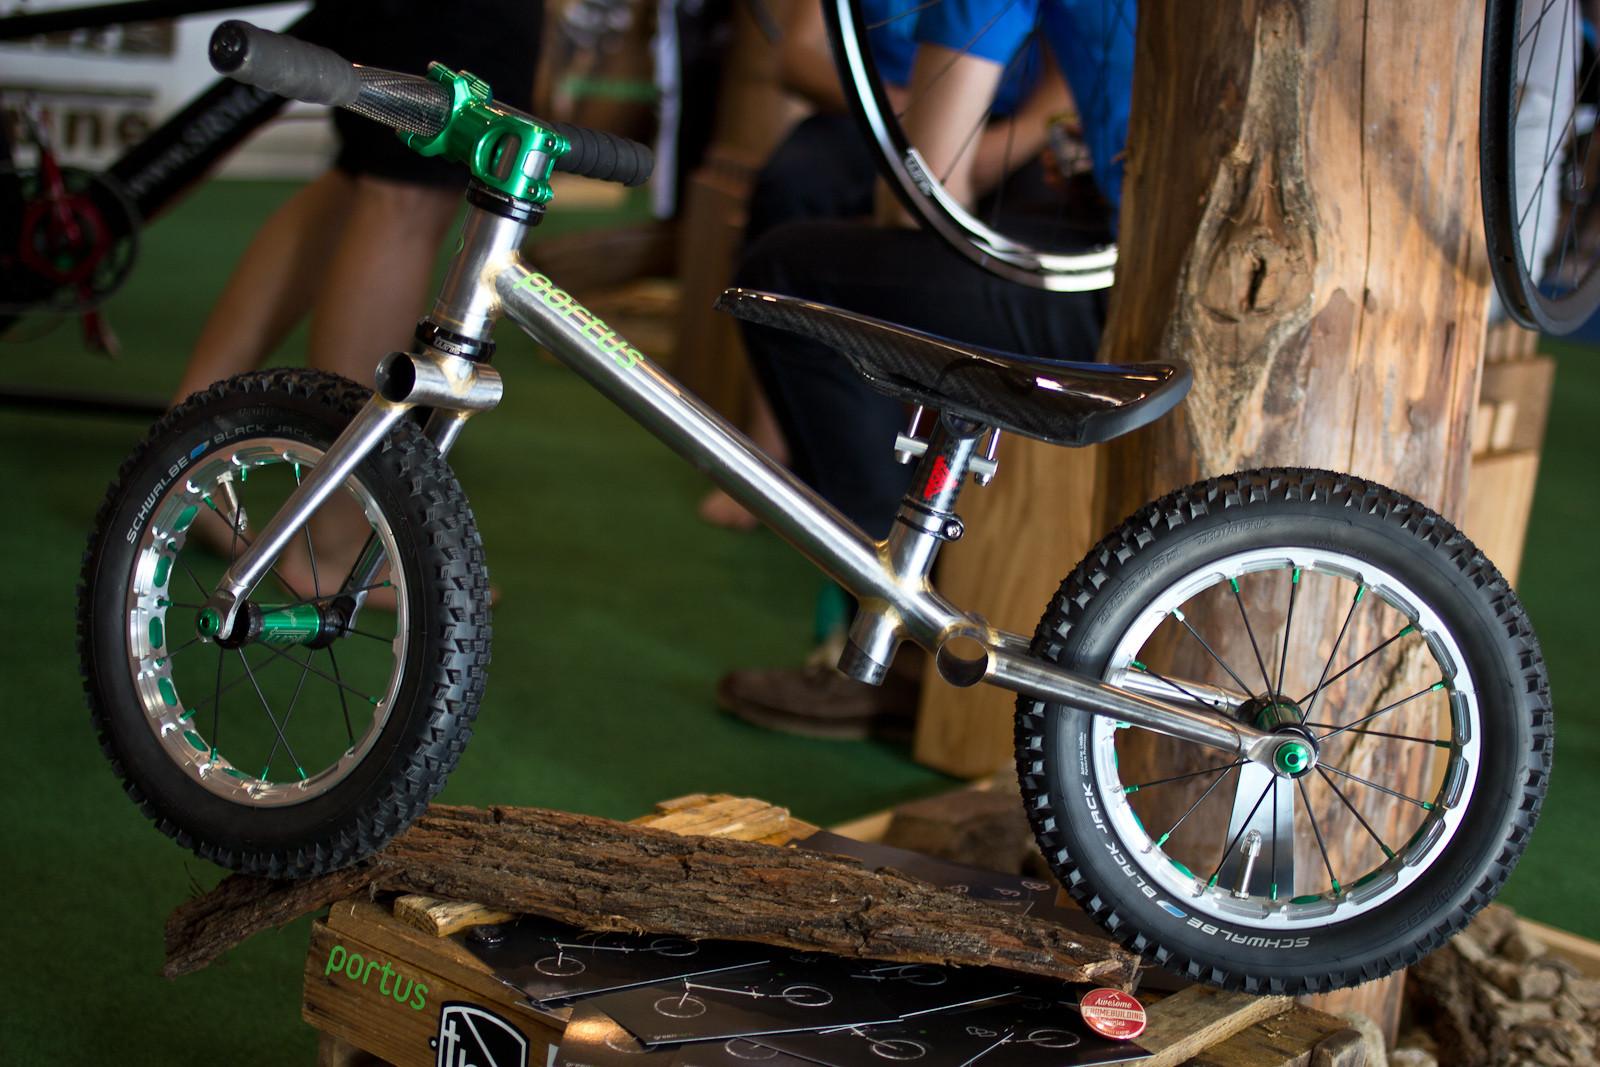 Portus Cycles Greenhorn Push Bike - 2014 Kids Bikes at Eurobike 2013 - Mountain Biking Pictures - Vital MTB